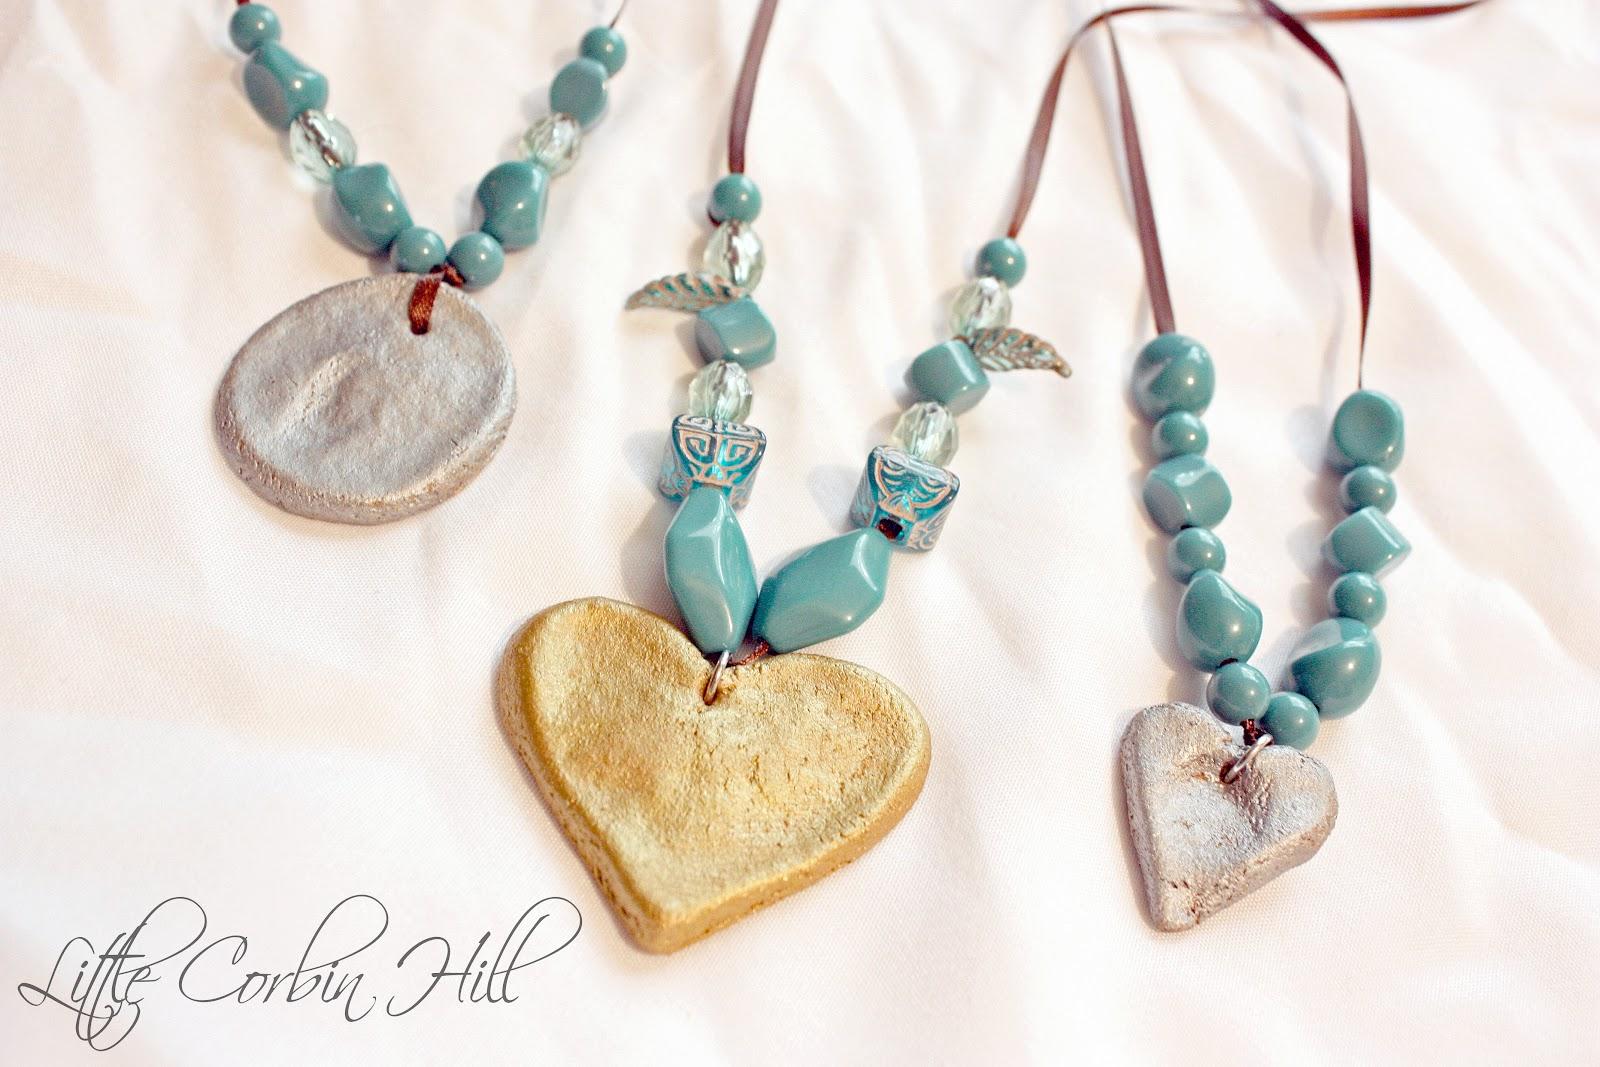 Little corbin hill mothers day salt dough necklaces aloadofball Choice Image